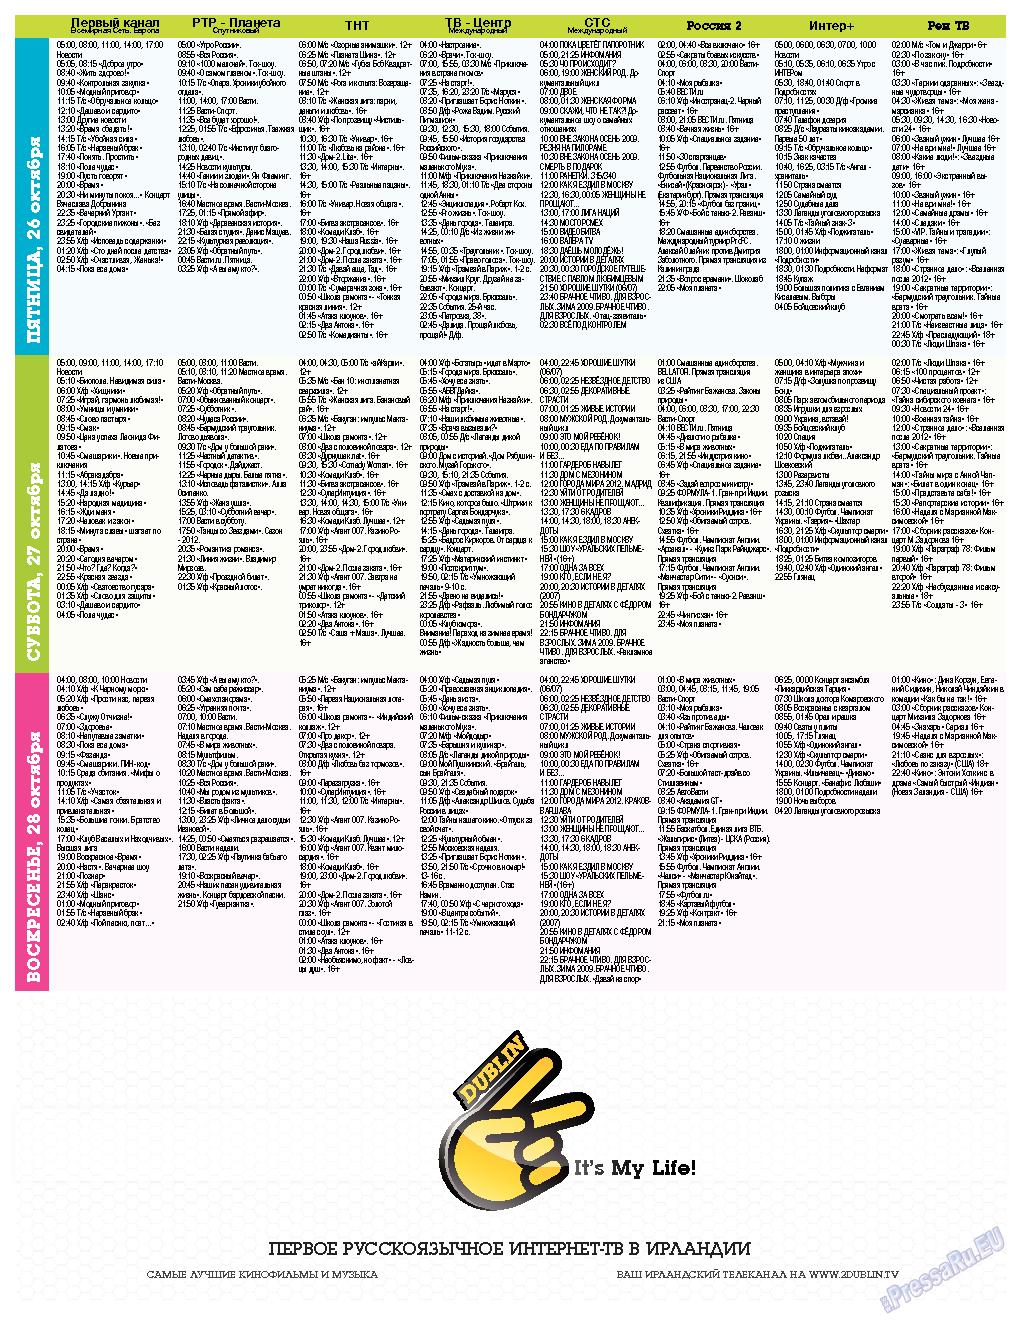 Дублин инфоцентр (газета). 2012 год, номер 38, стр. 9